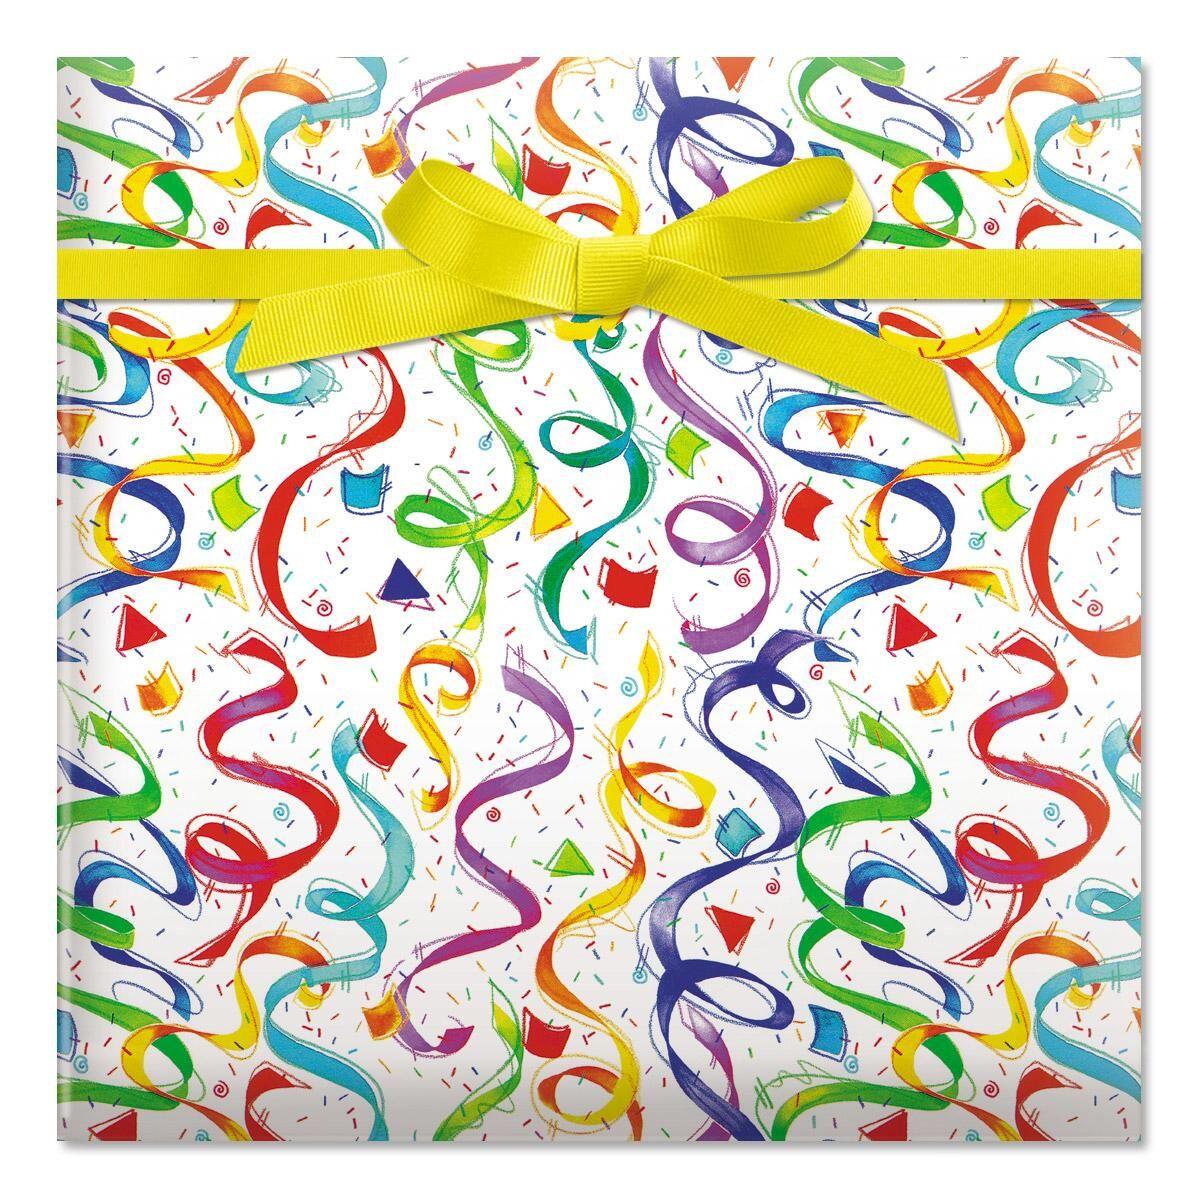 Happy Birthday Confetti Jumbo Rolled Gift Wrap